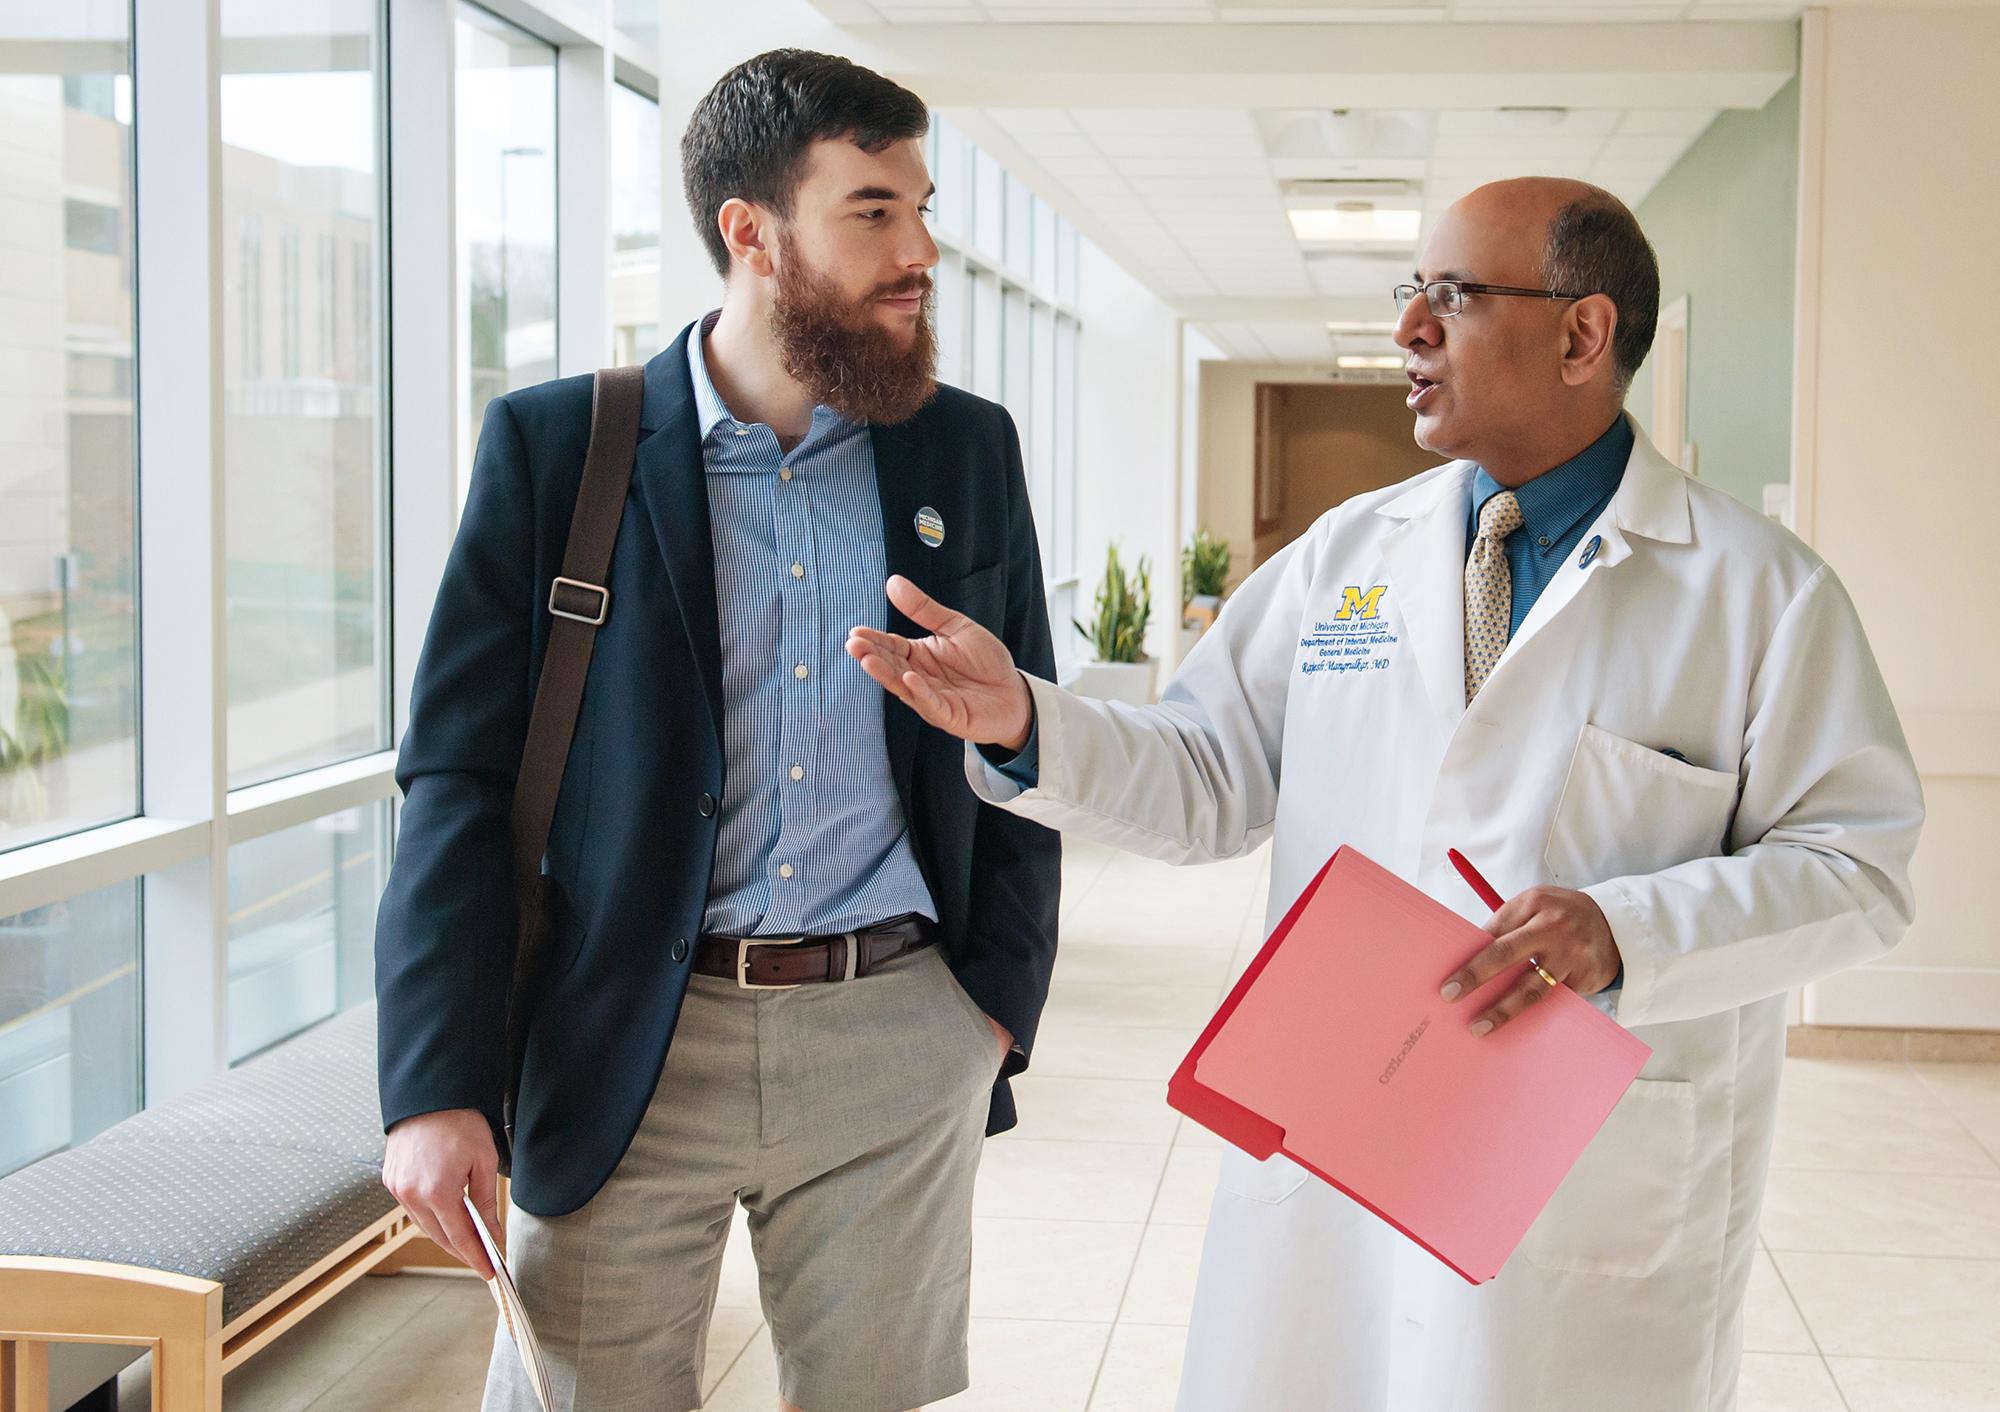 Medical Schools Reboot For 21st Century